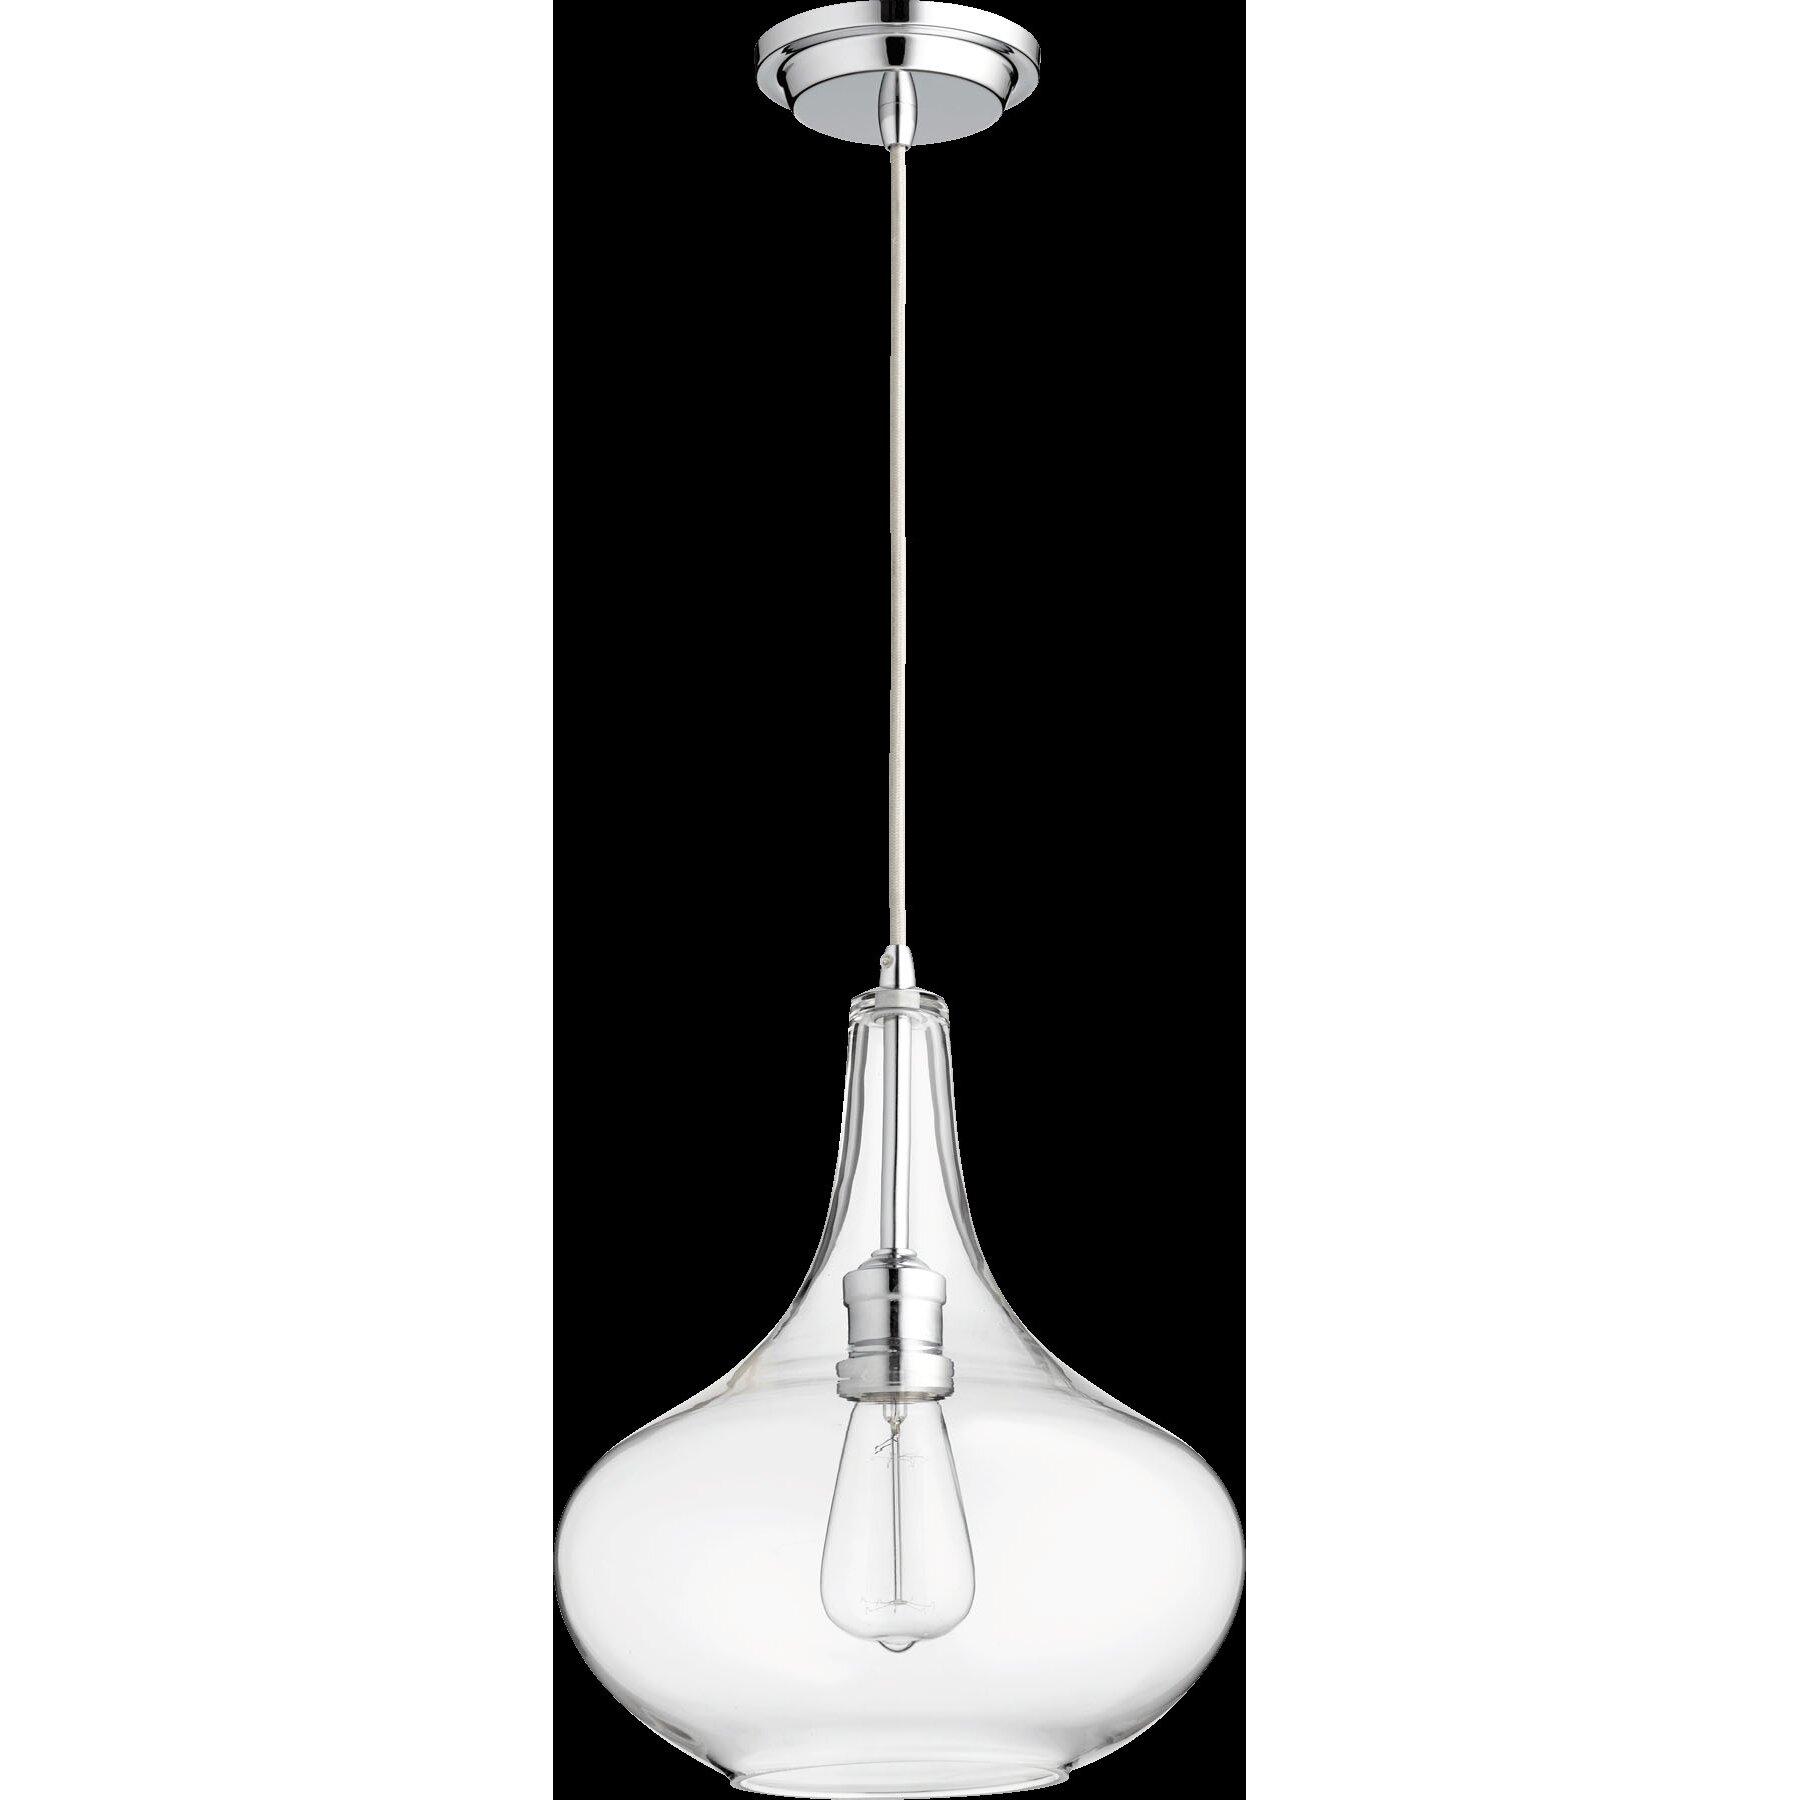 Quorum 1 Light Mini Pendant & Reviews